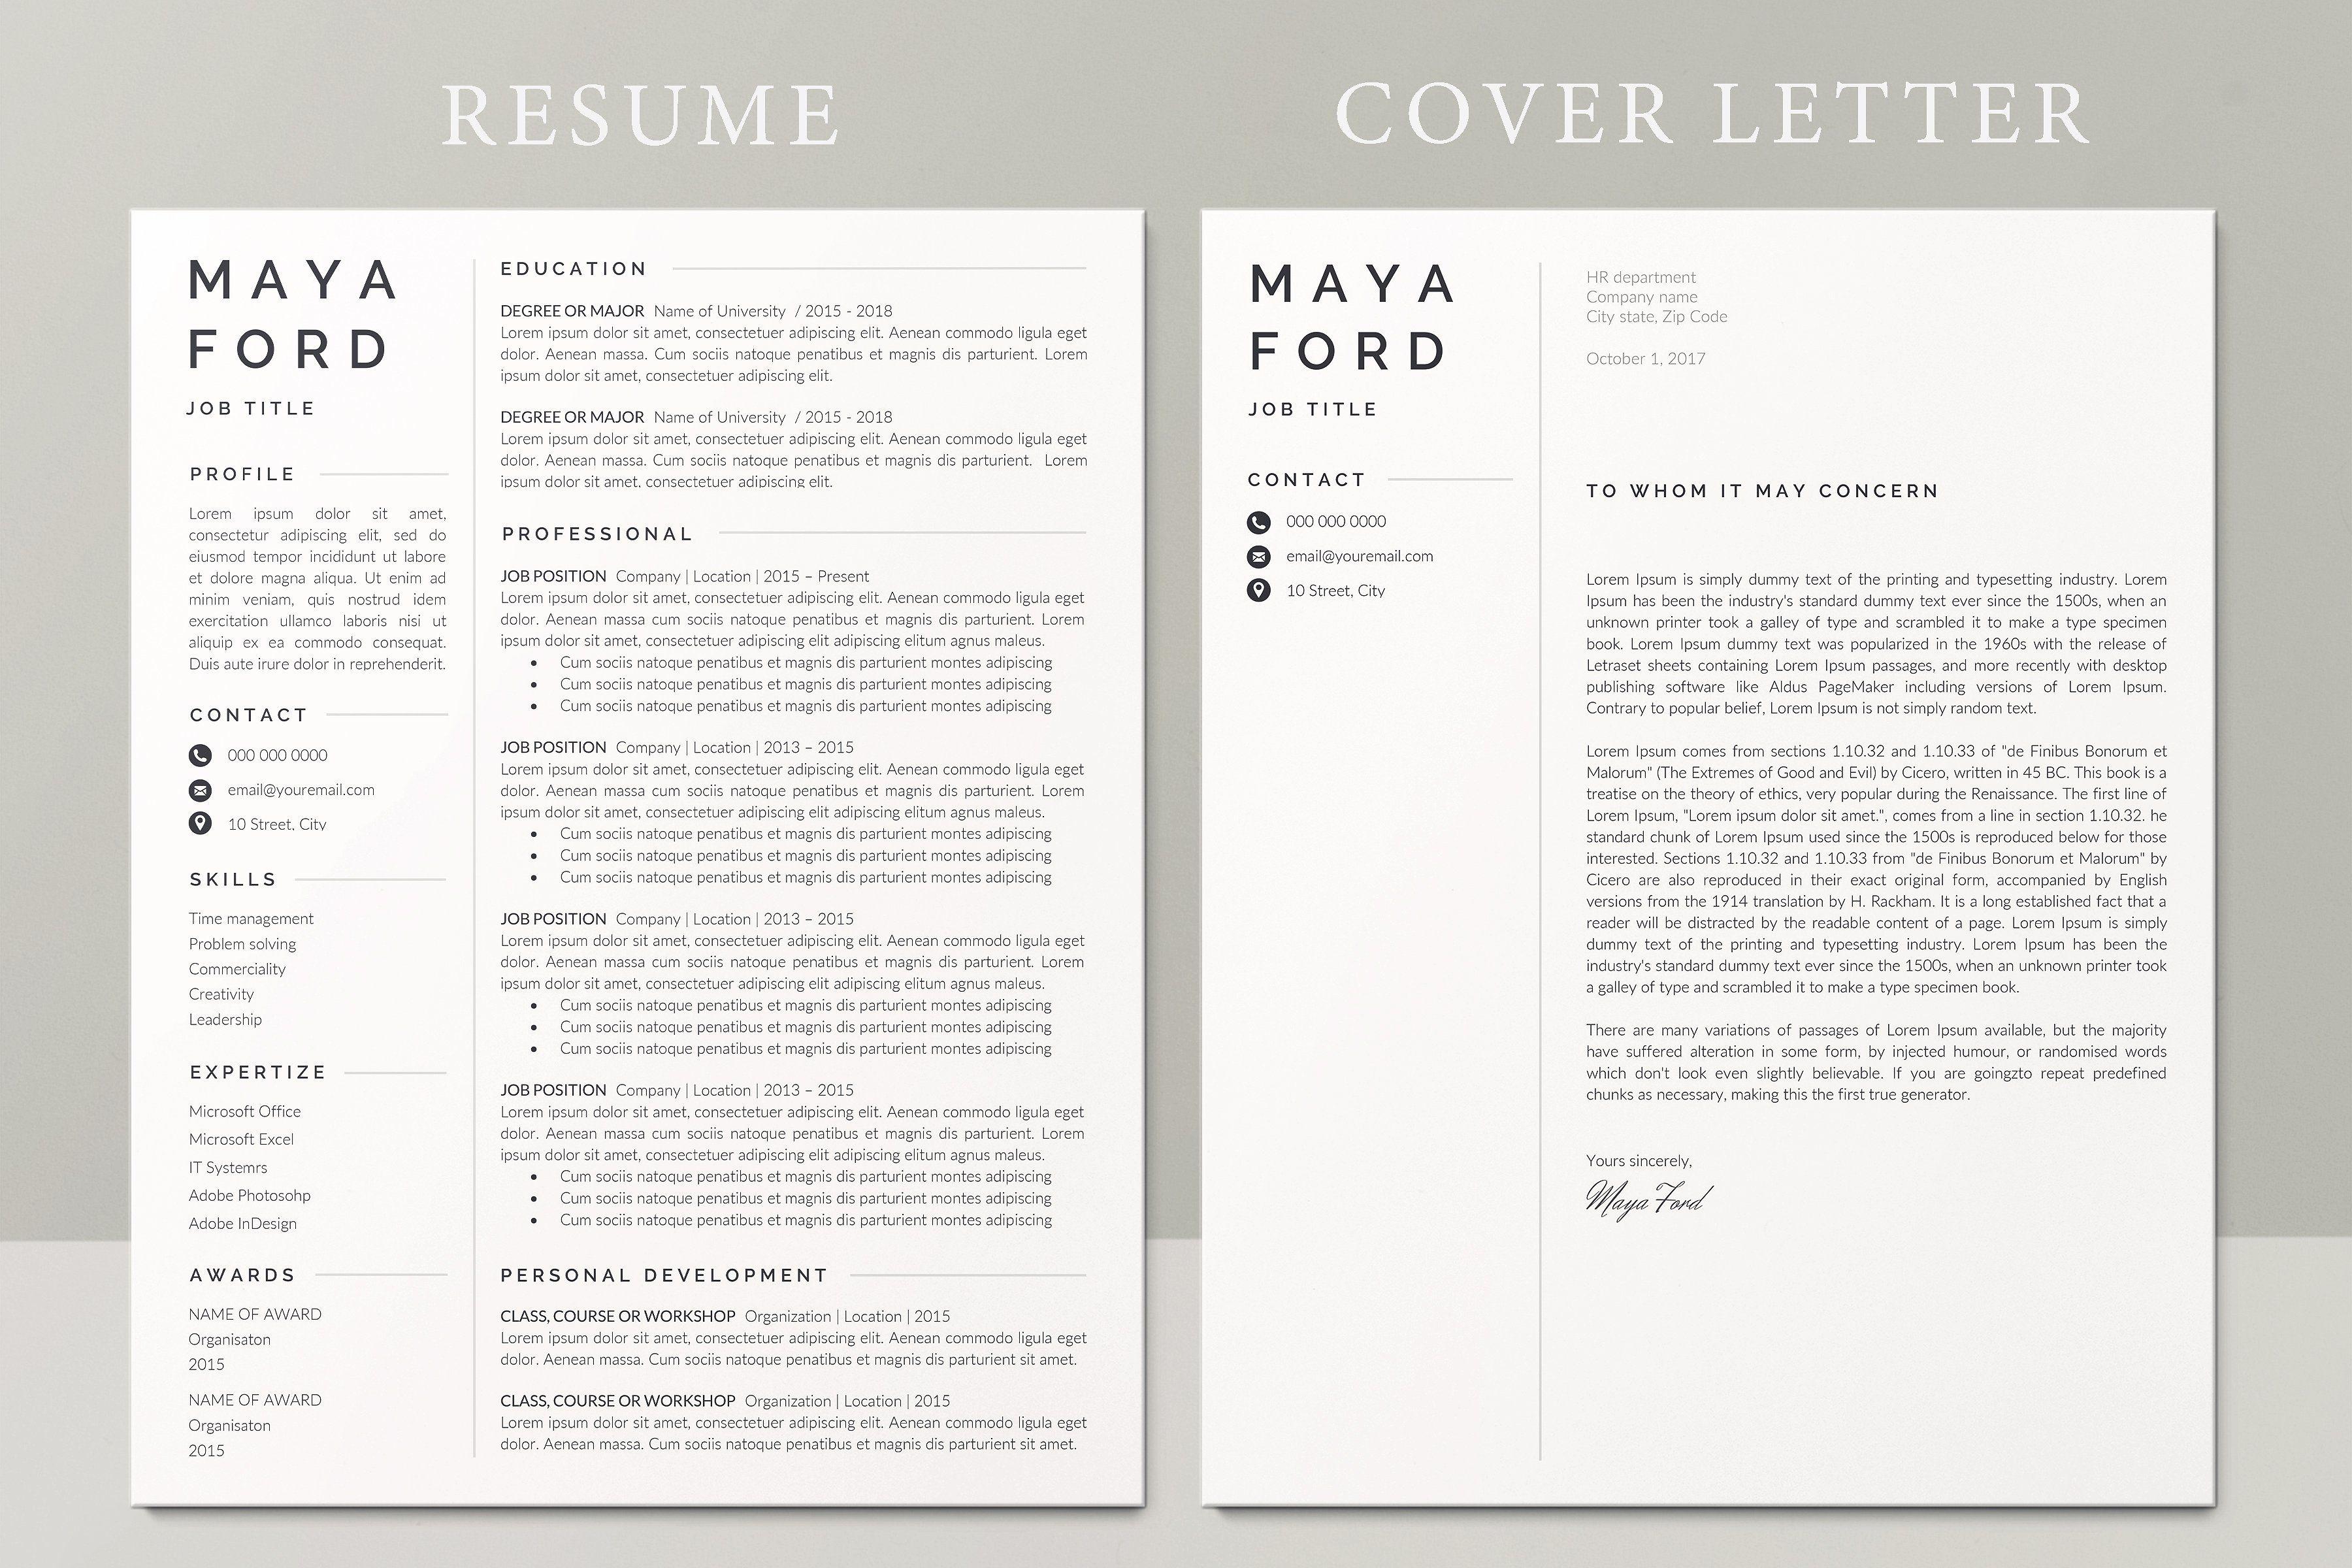 Resume Template / CV(画像あり)